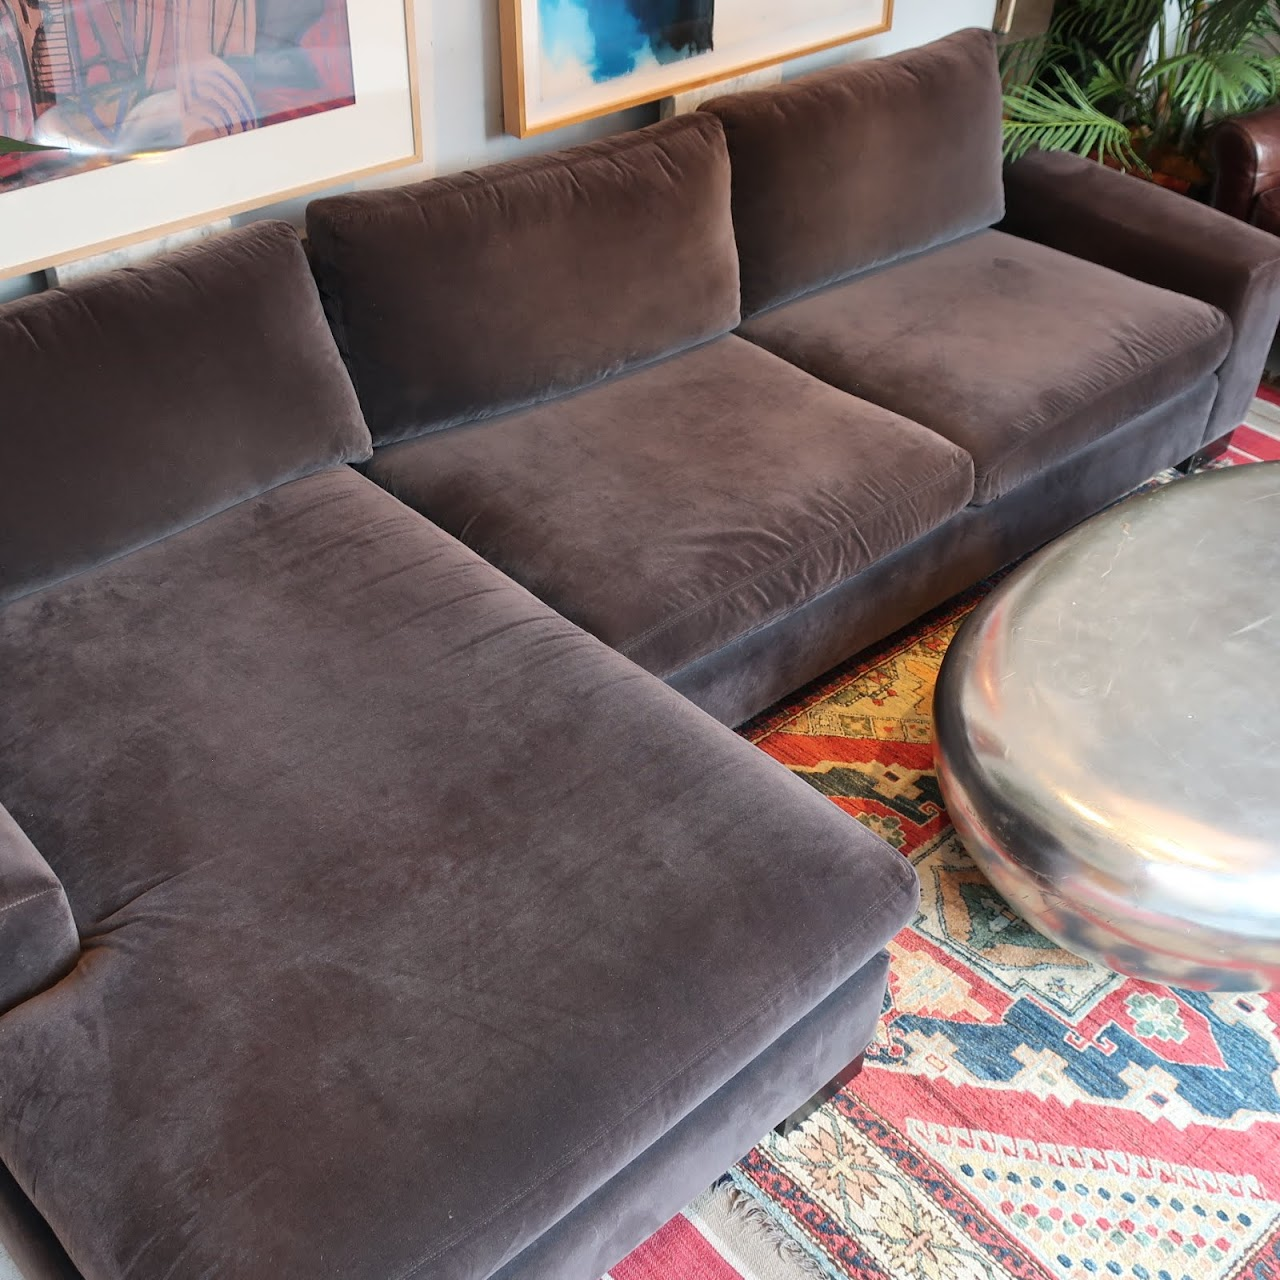 Wondrous Room Board 10 Sectional Sofa Shophousingworks Pabps2019 Chair Design Images Pabps2019Com